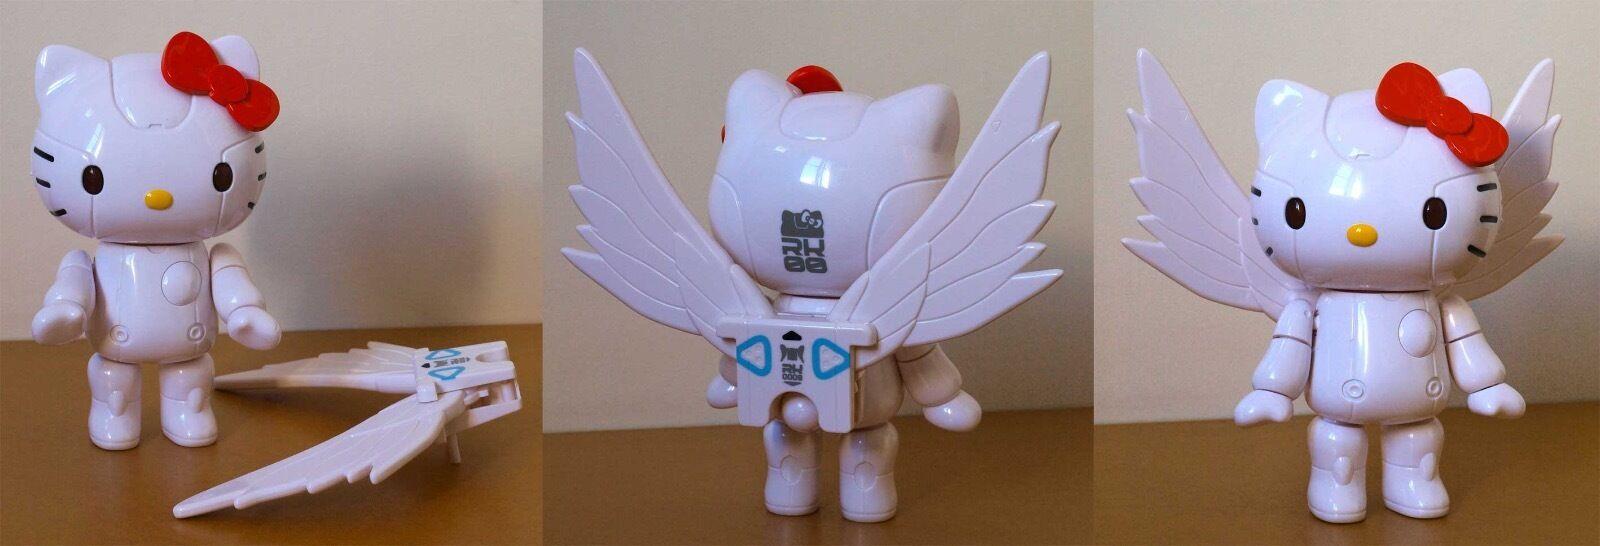 Hello Kitty Robot Robot Robot K Kittyrobot Sanrio Japan Collectible figure wings 1cc1a0